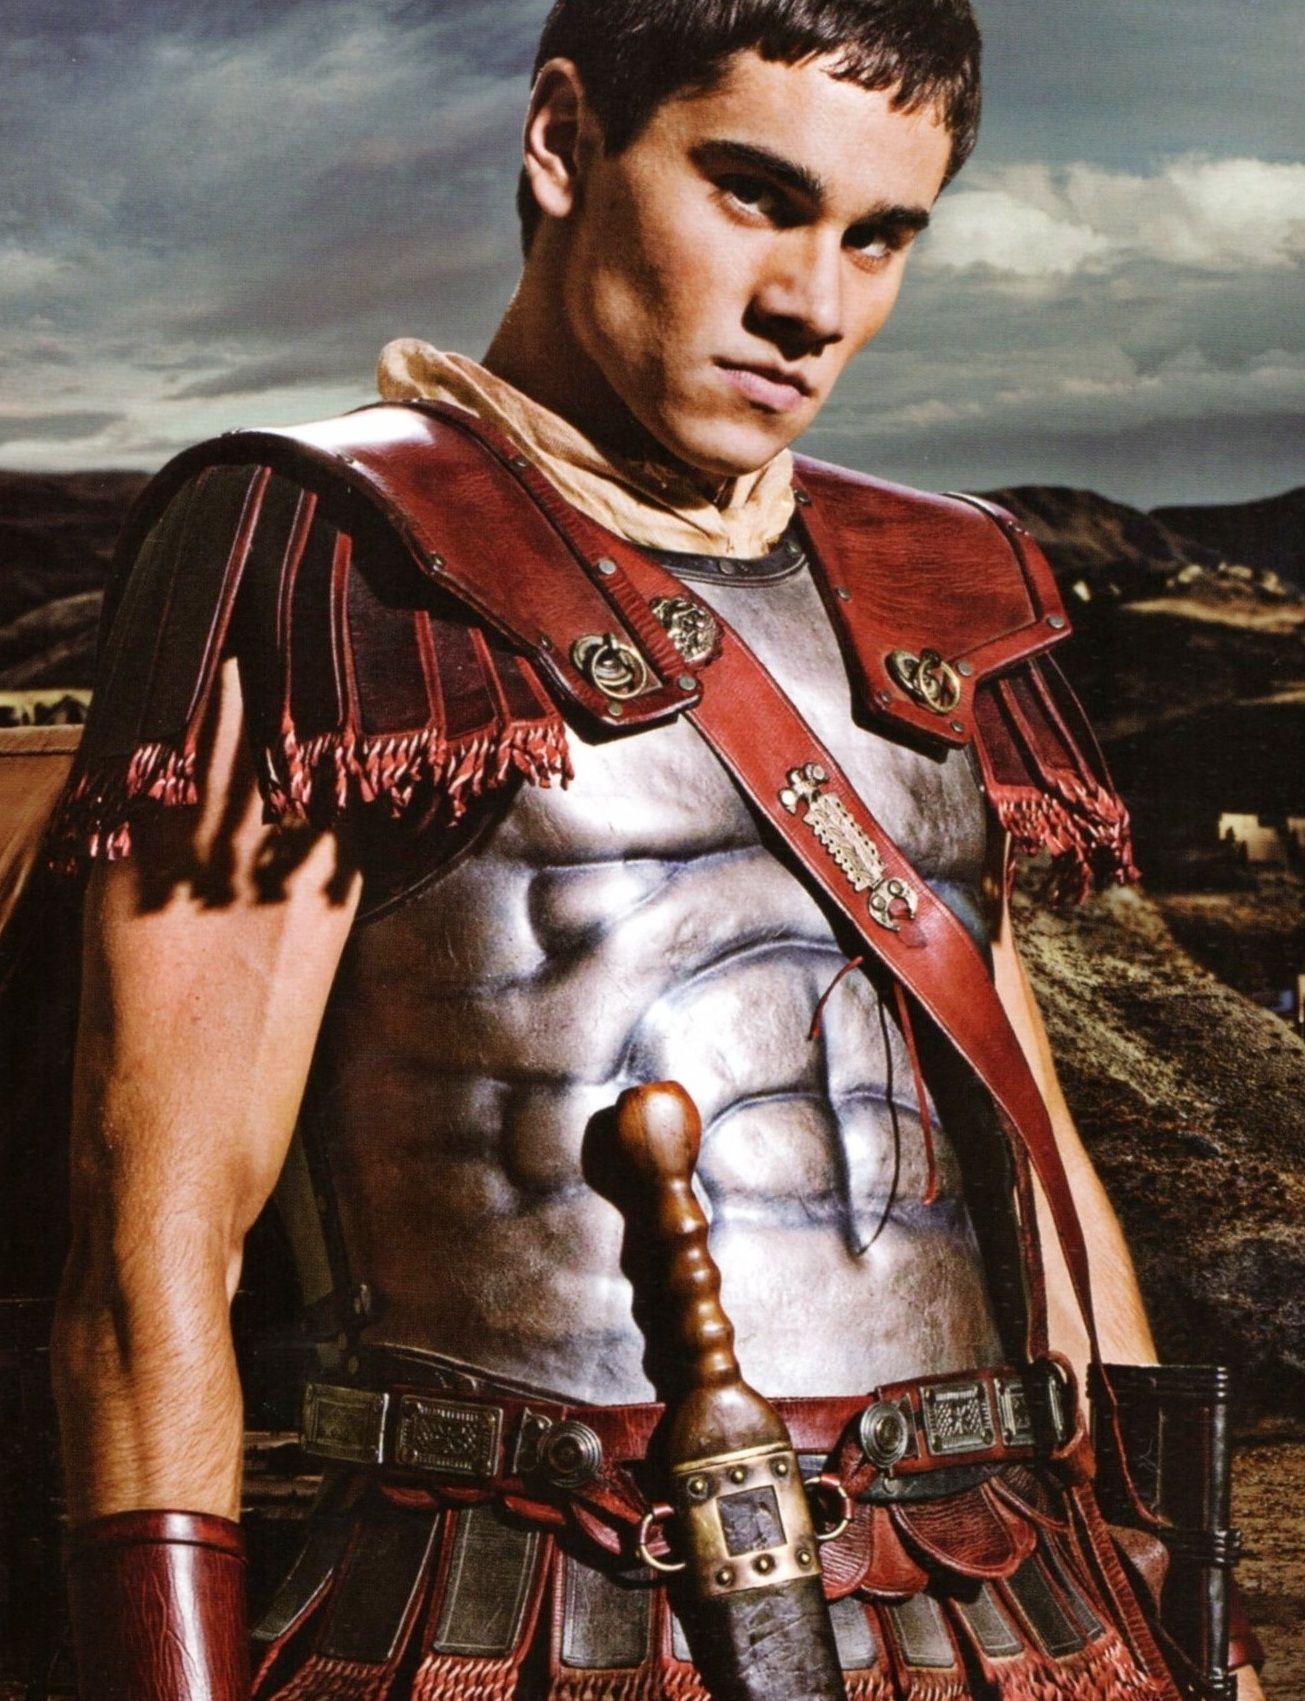 Laurence olivier spartacus quotes - Spartacus